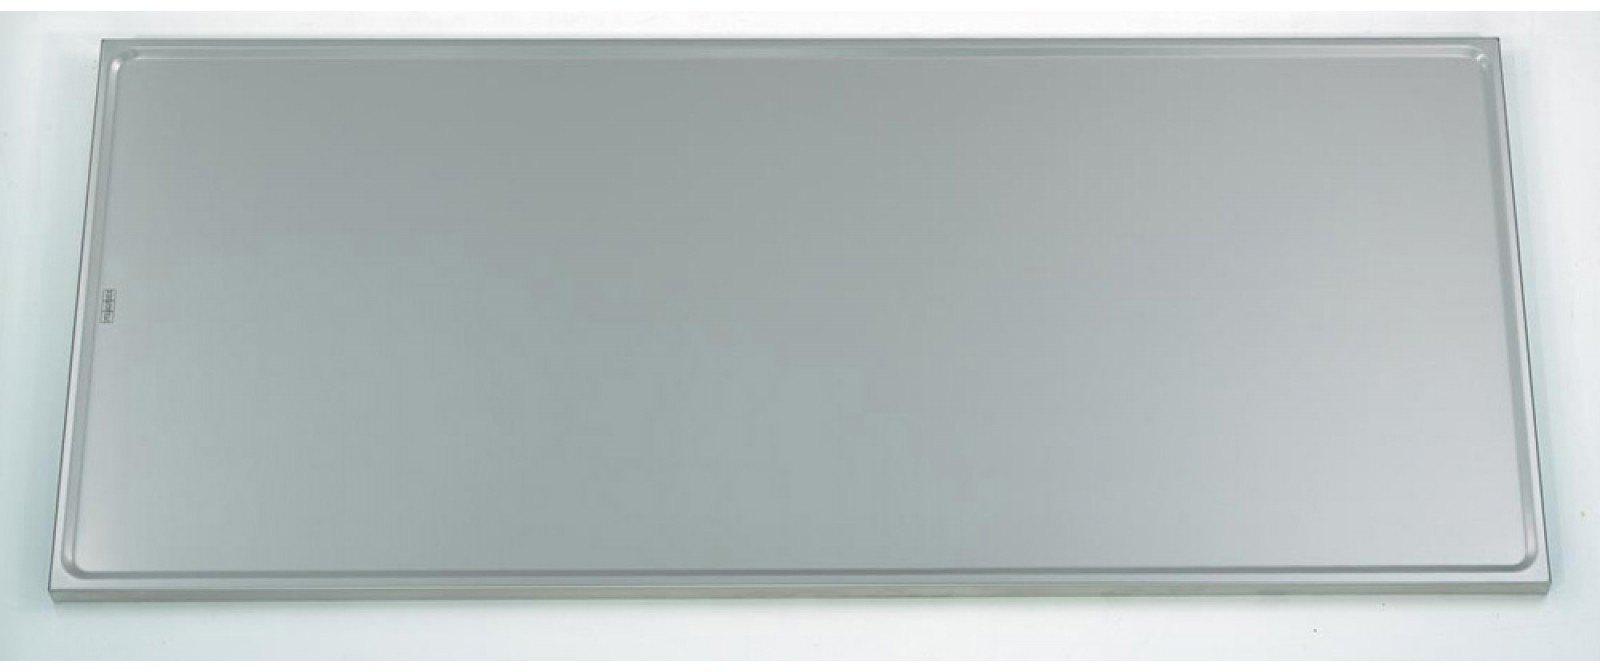 Keittiötaso Franke Eeva 1700 1700×600 mm rst  Terästasot  Taloon com